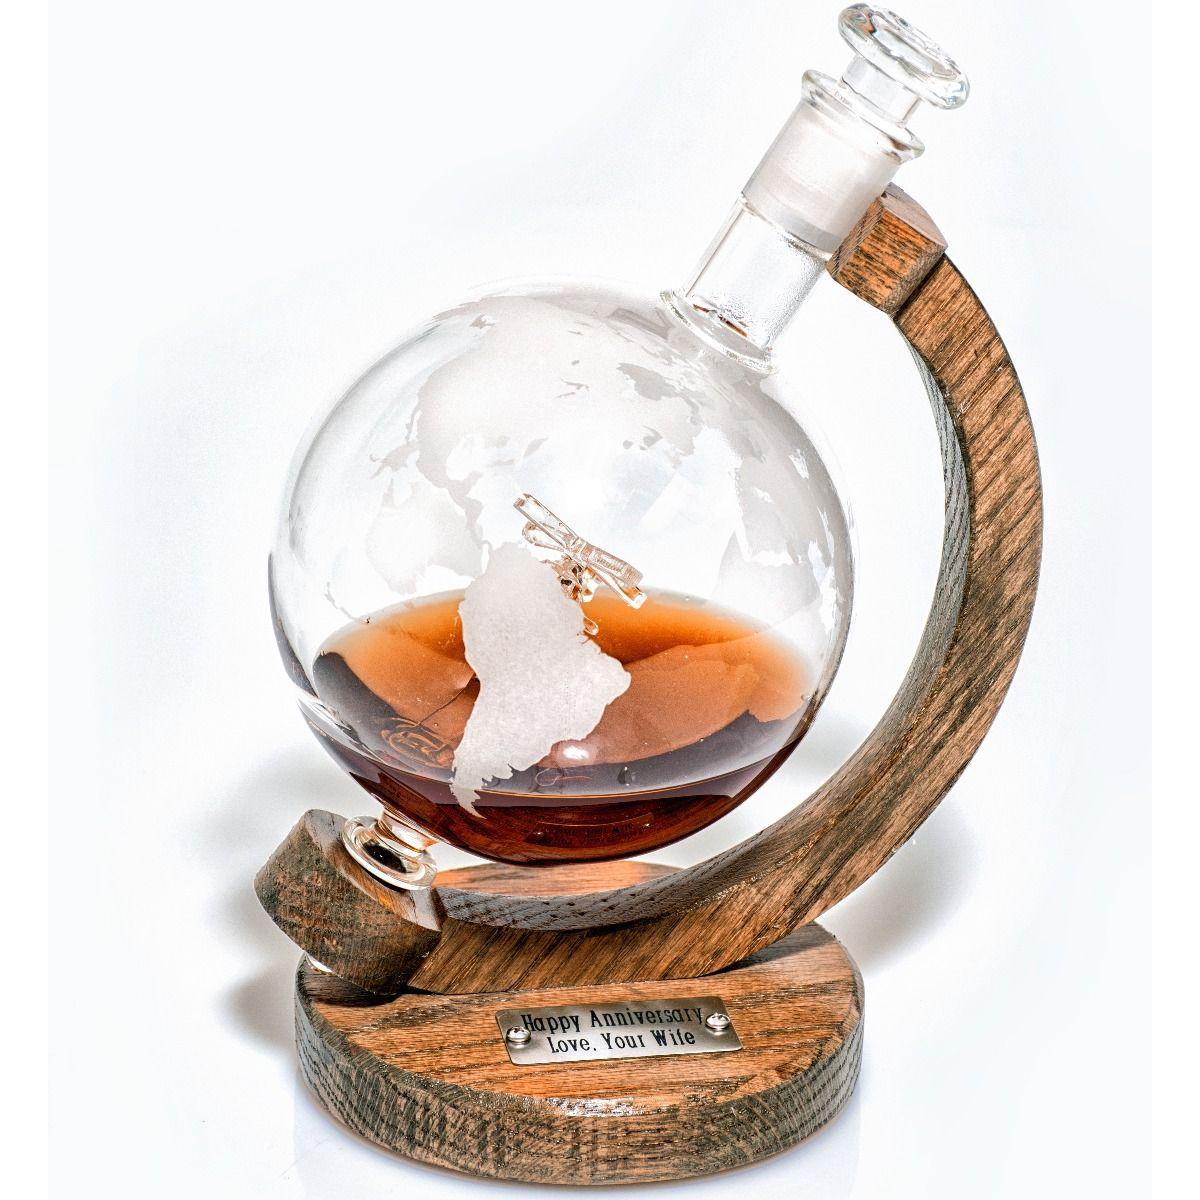 Engraved globe helicopter black hawk liquor decanter